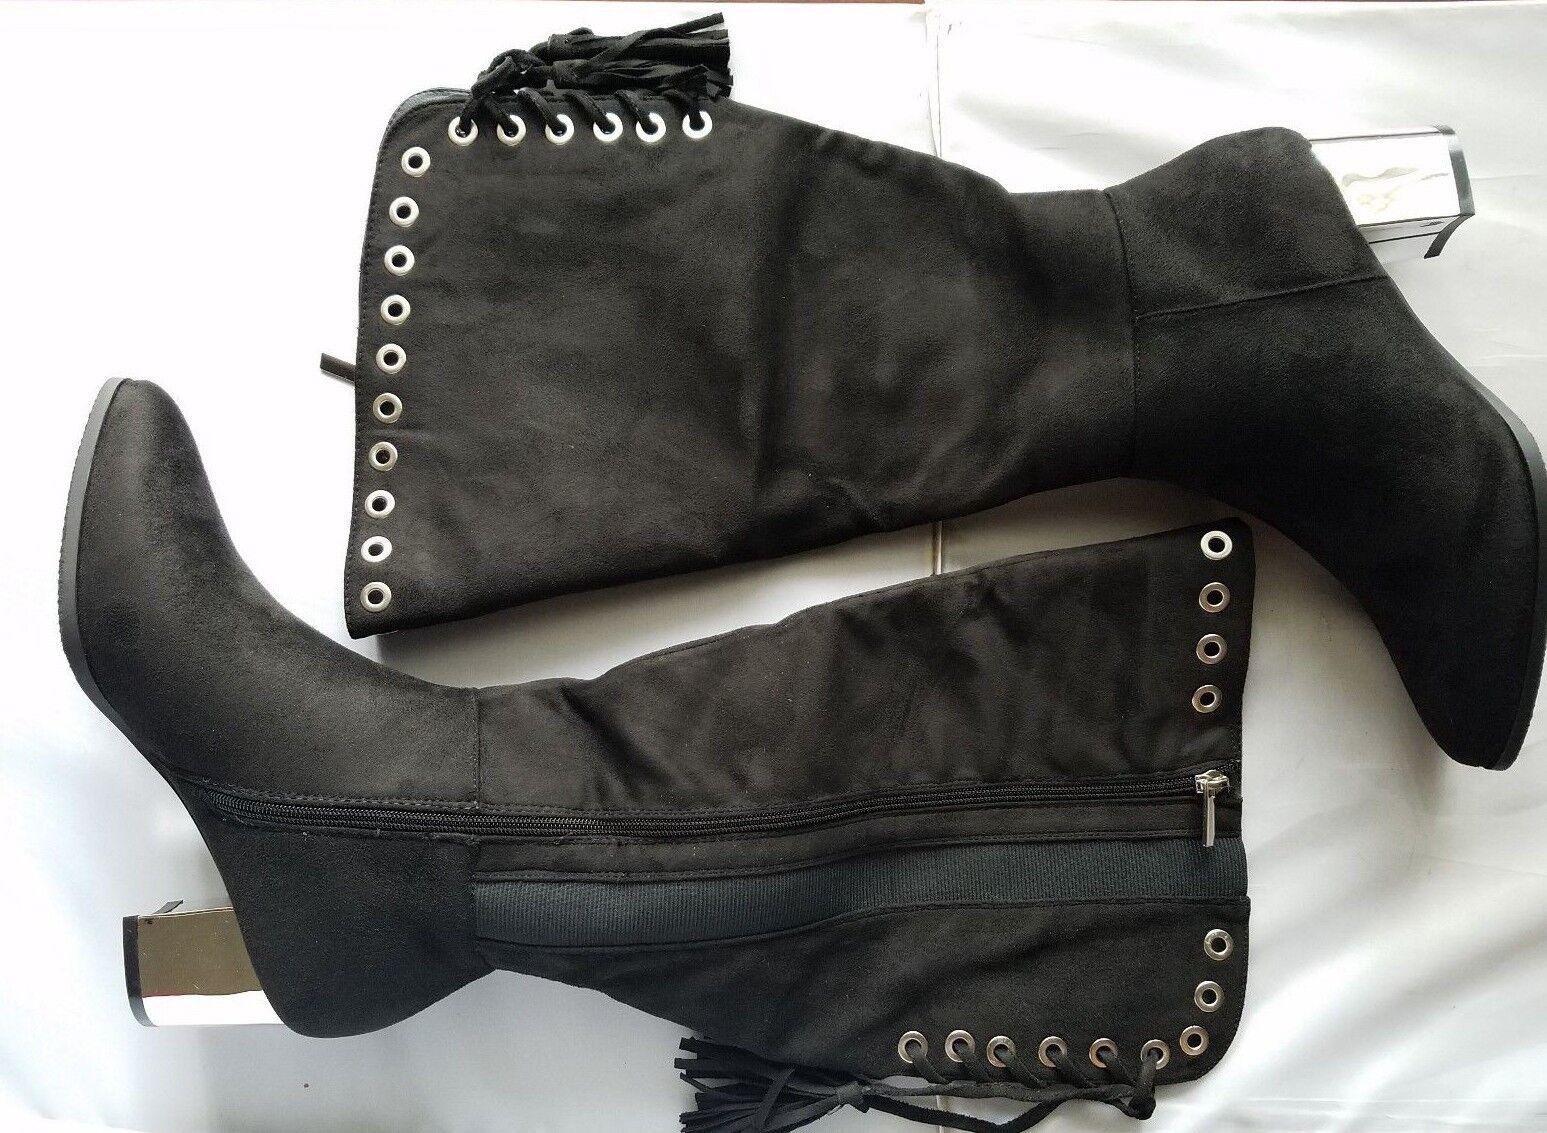 NEW Cloudwalkers Corbin Women's Boots Suede Black Grommets Knee High 7 / 8 / 9 W